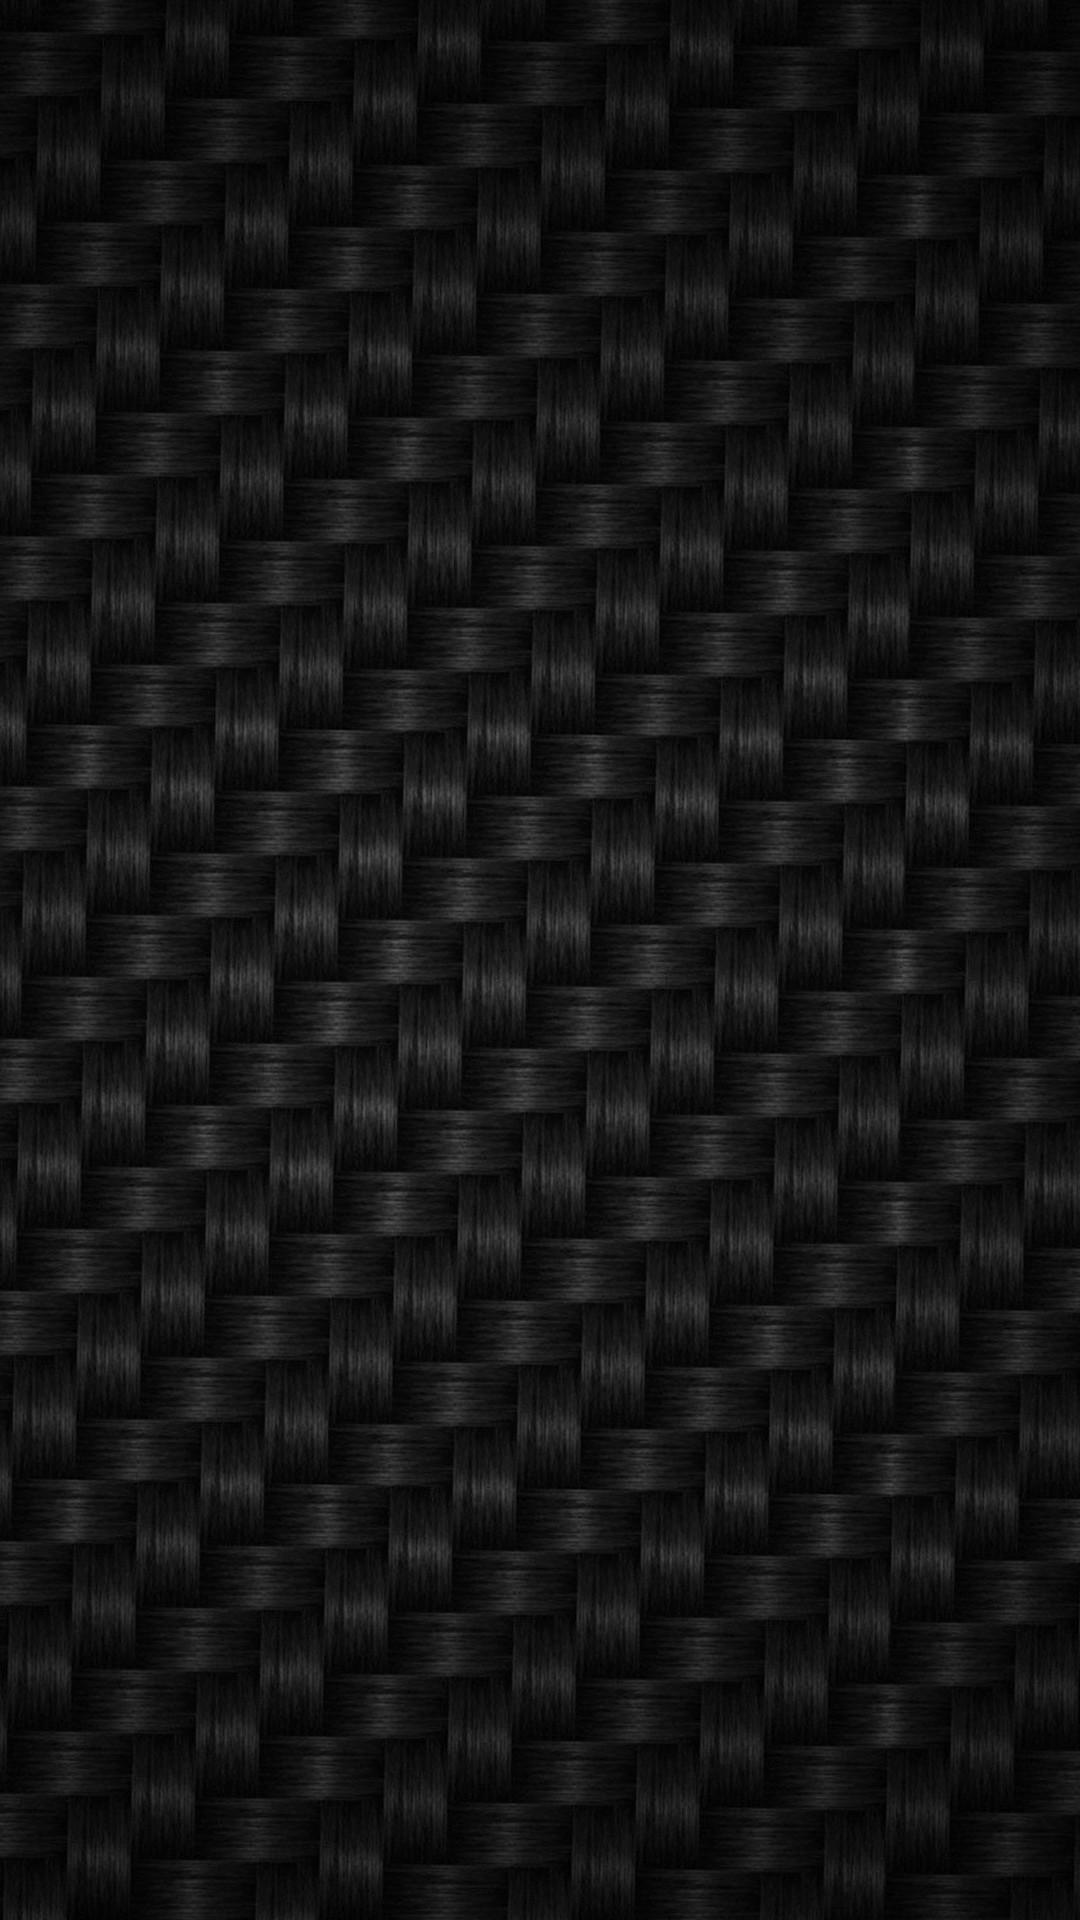 Carbon fiber htc one wallpaper